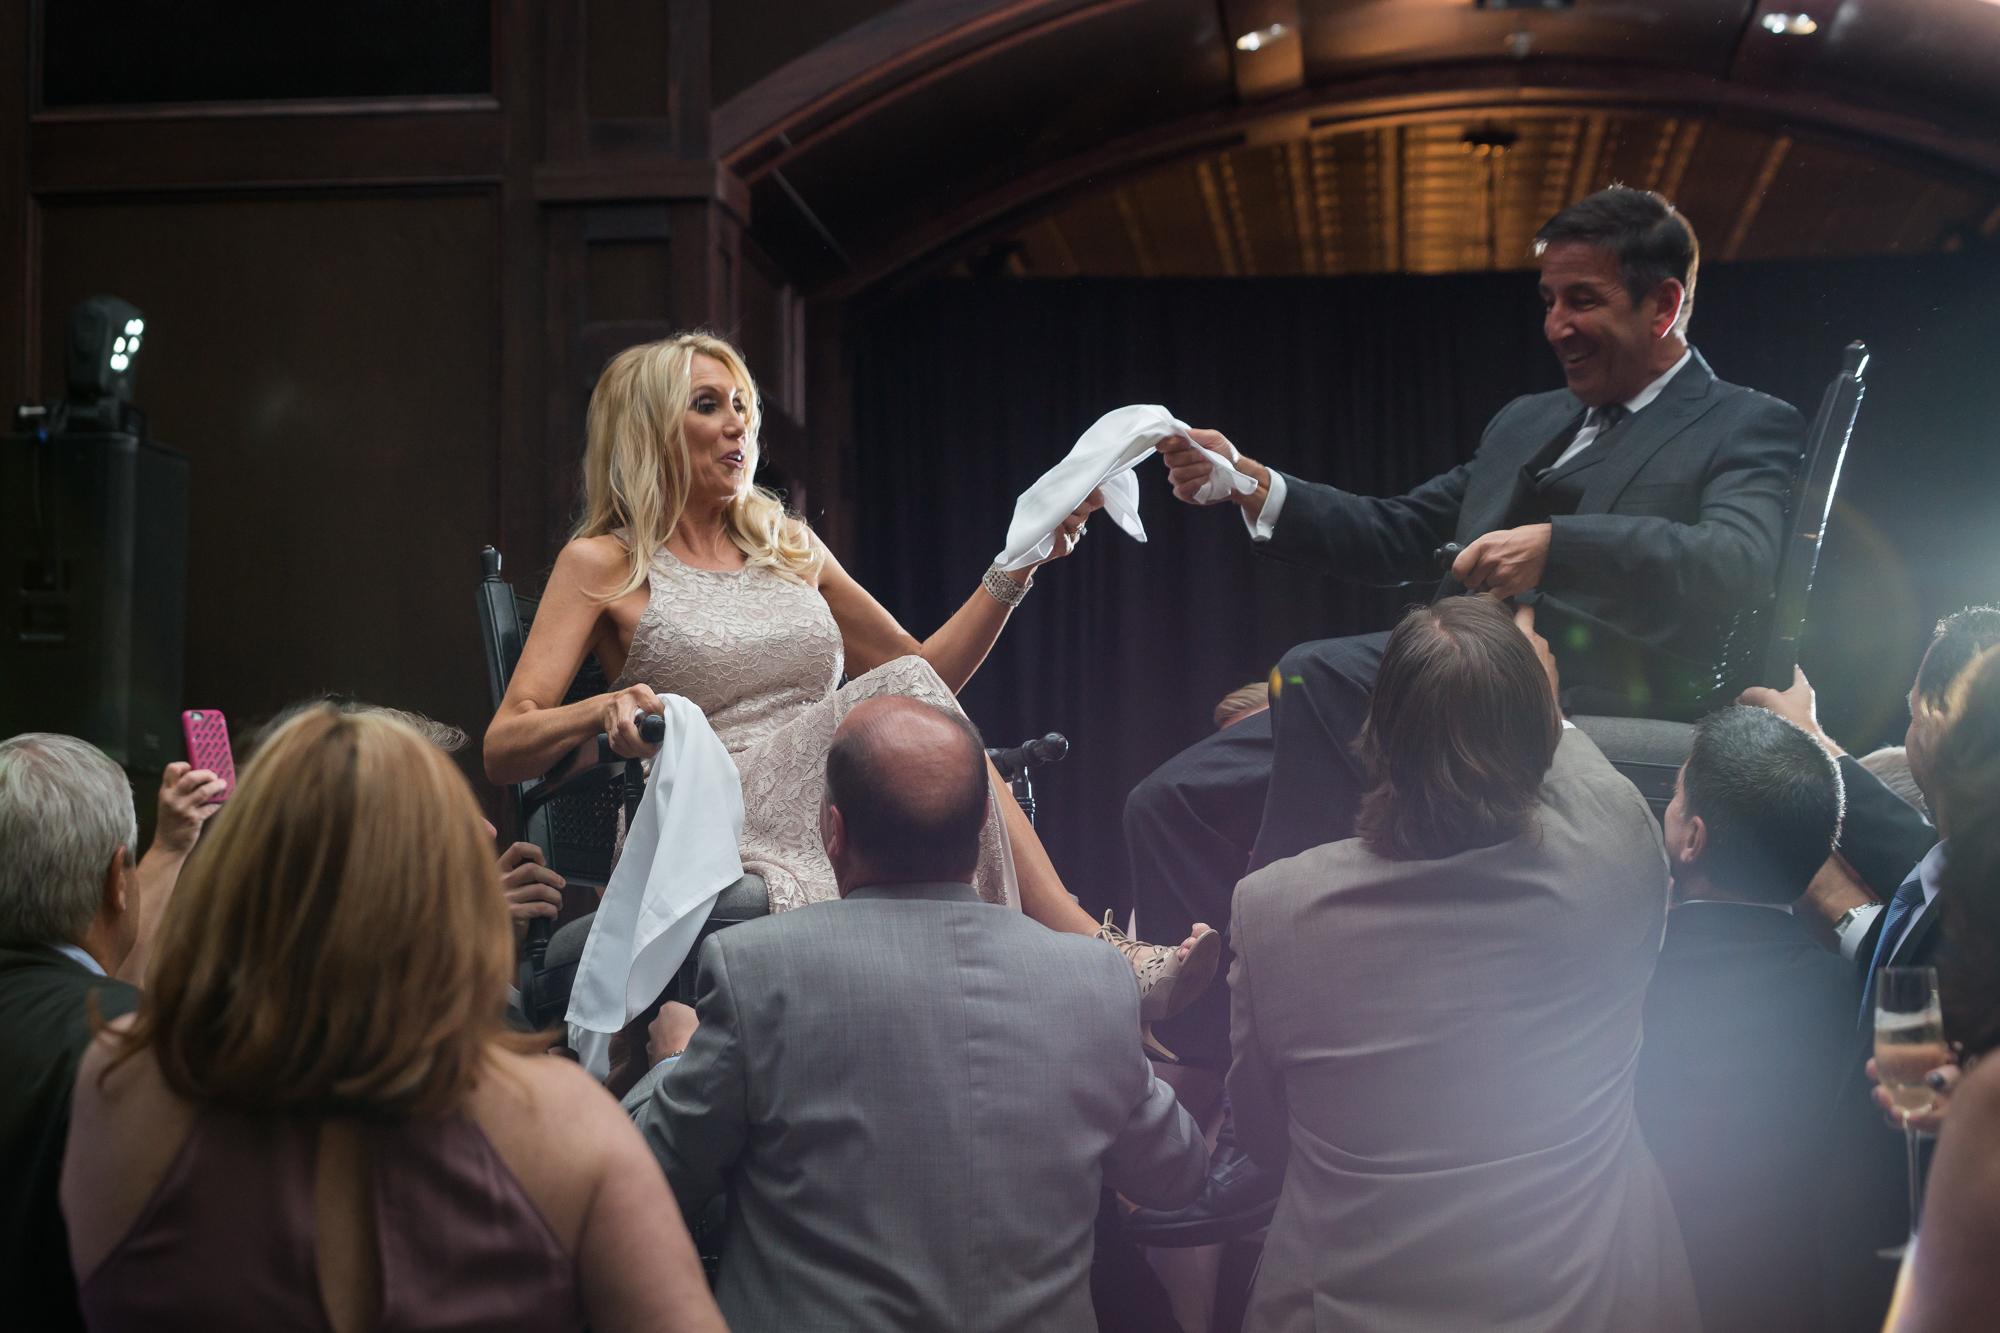 Oxford-Exchange-wedding-party-photo